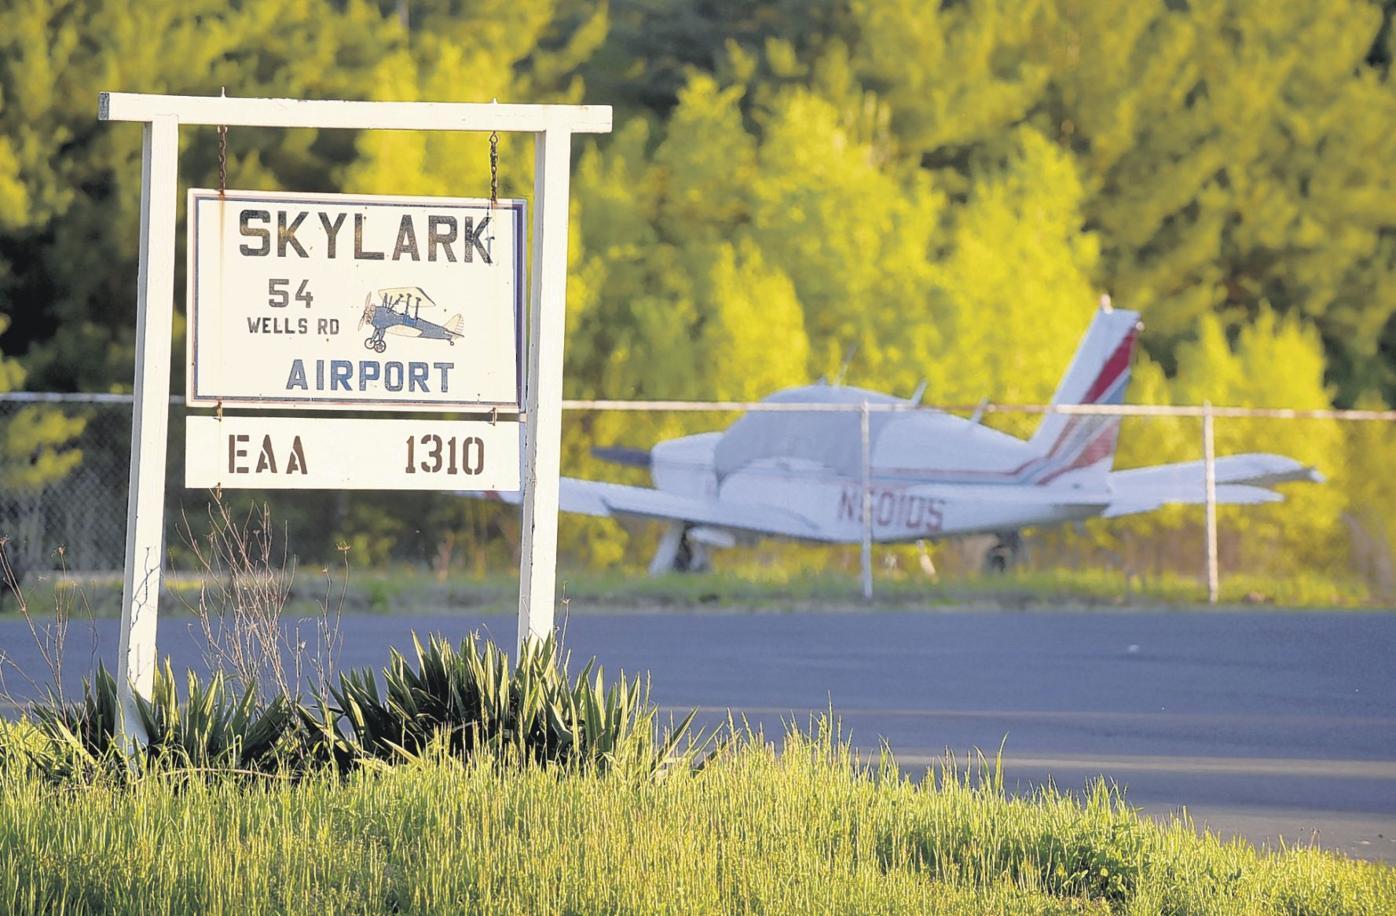 Skylark Airport, owned by Bruce Bemer